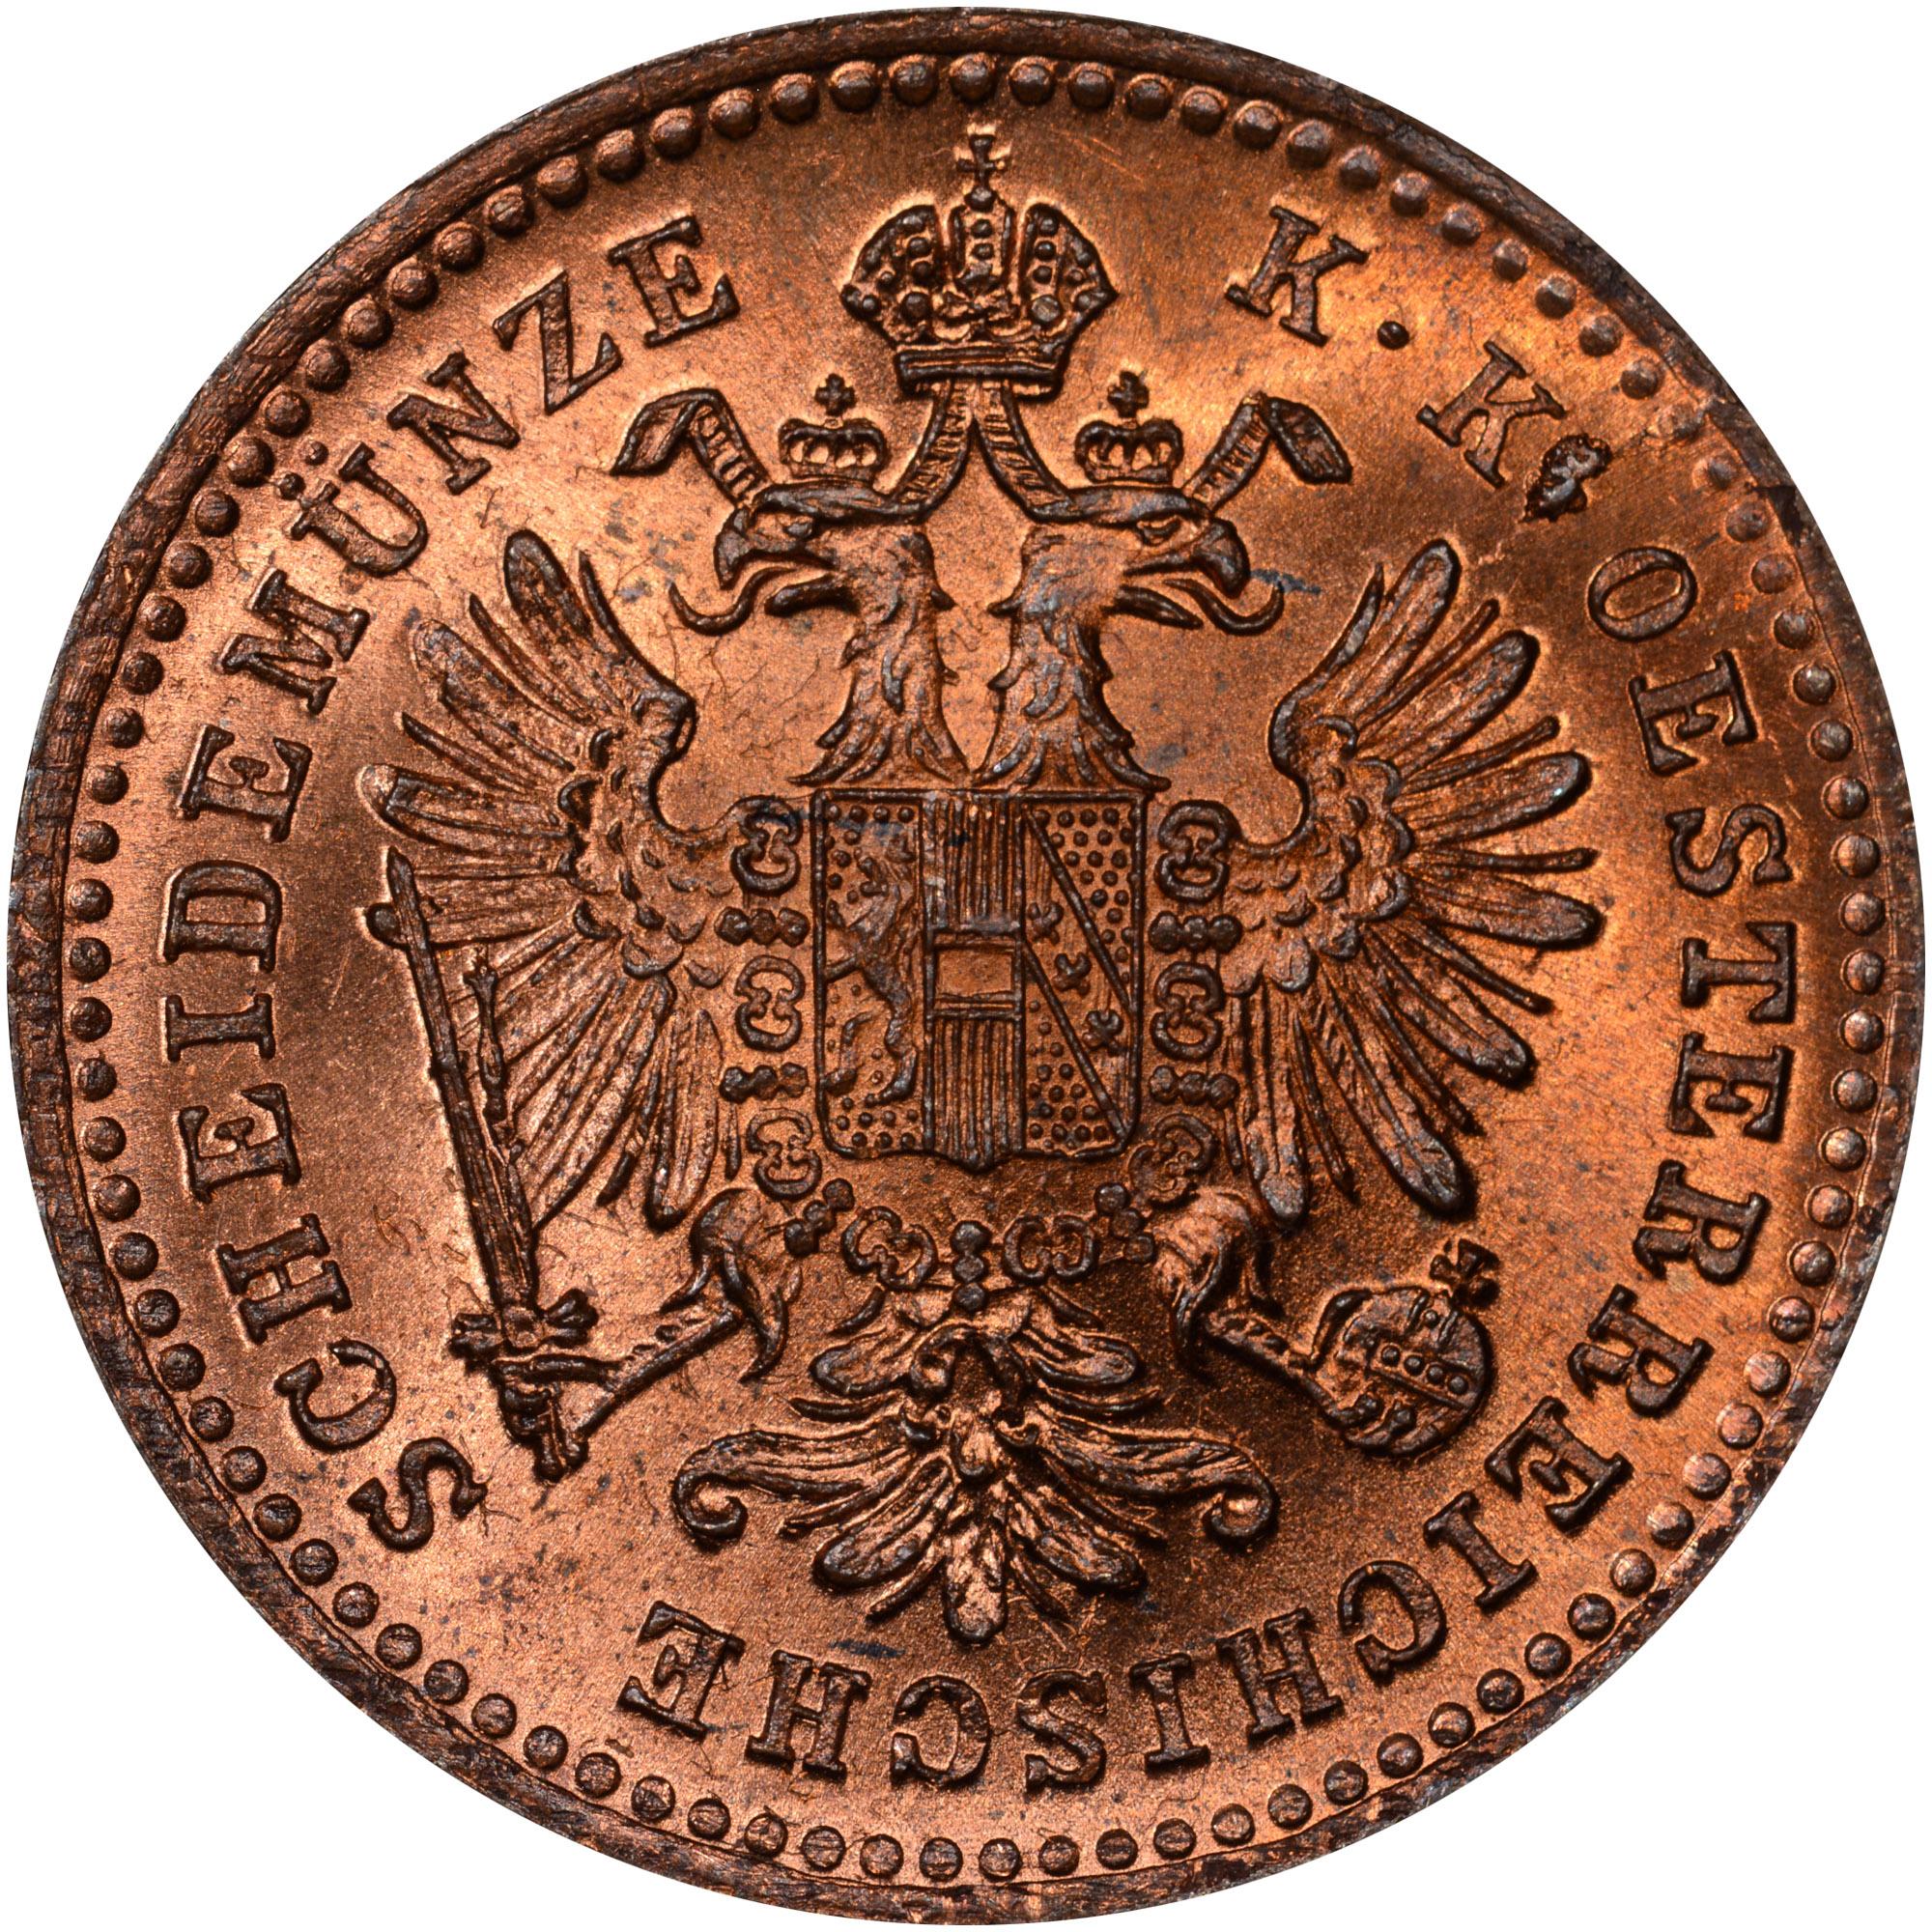 1858-1881 Austria Kreuzer obverse